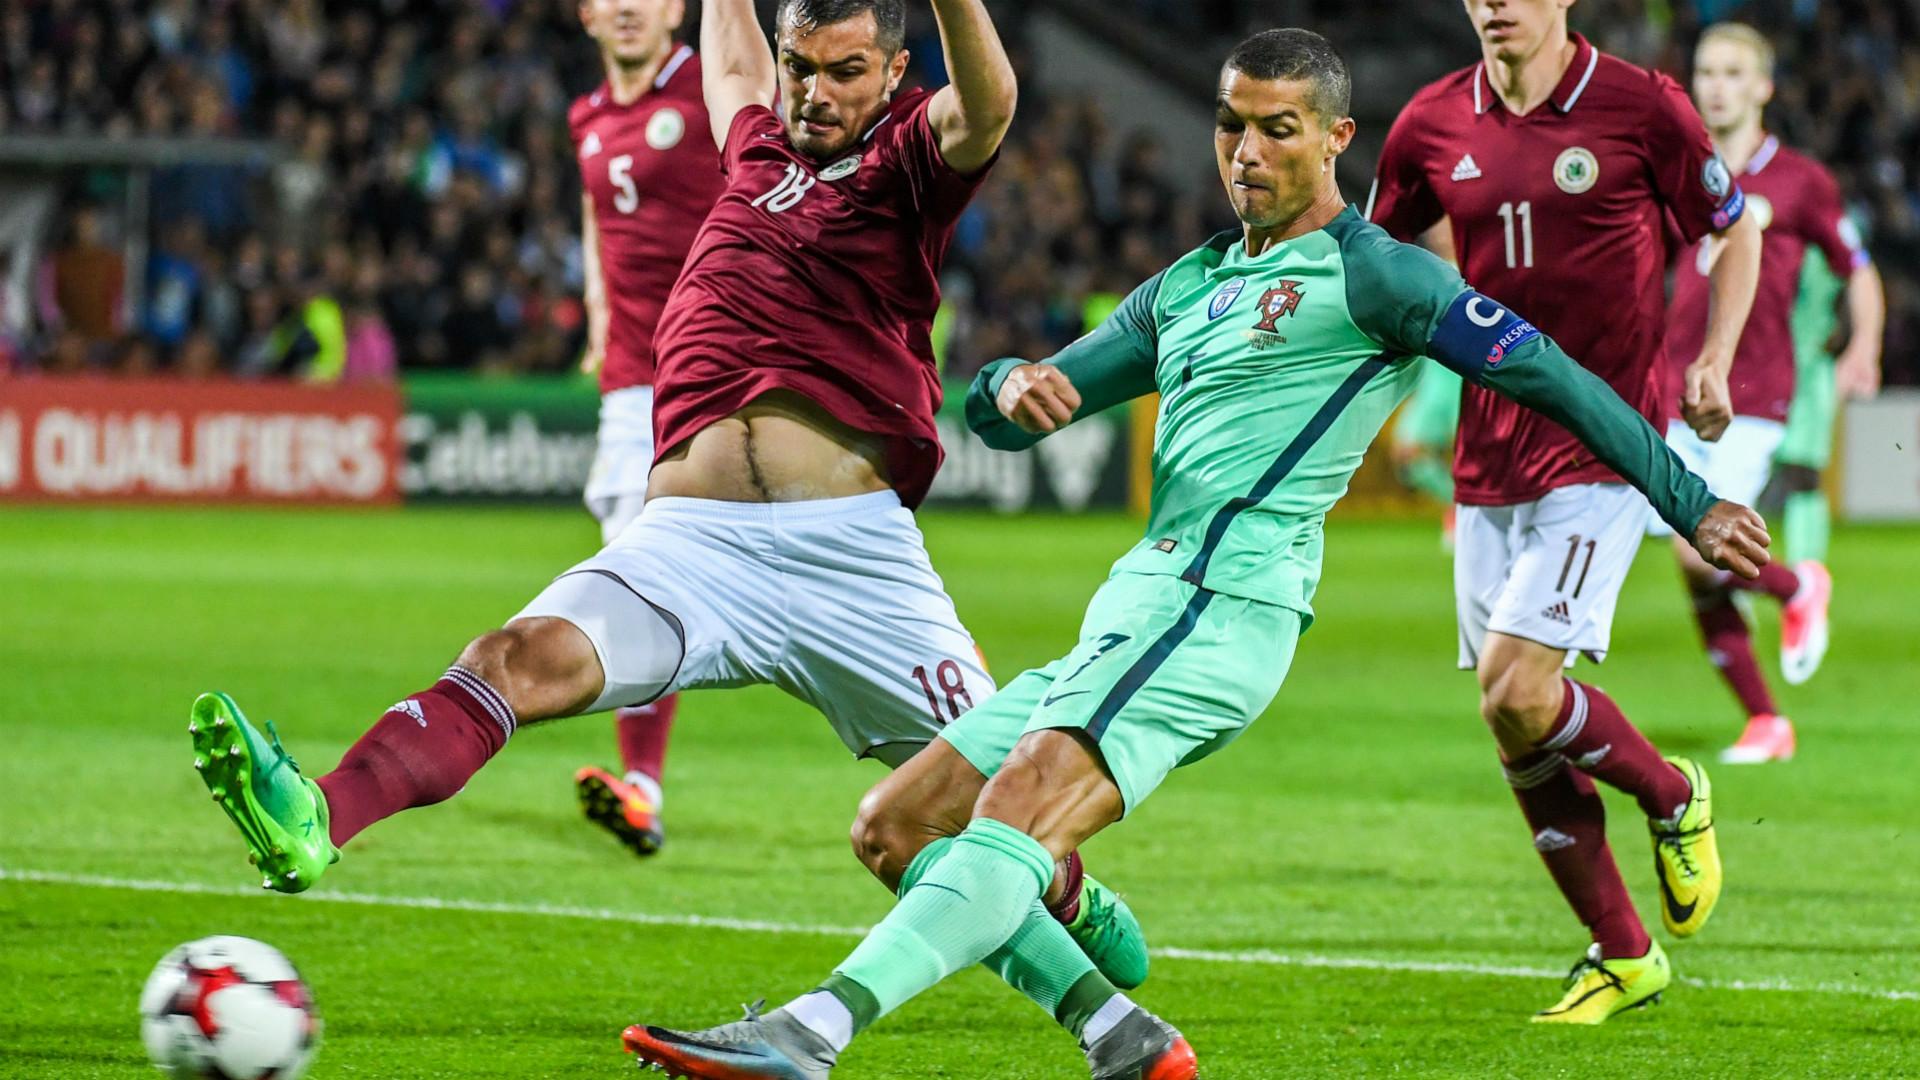 Copa Confederaciones: Rusia venció 2-0 a Nueva Zelanda